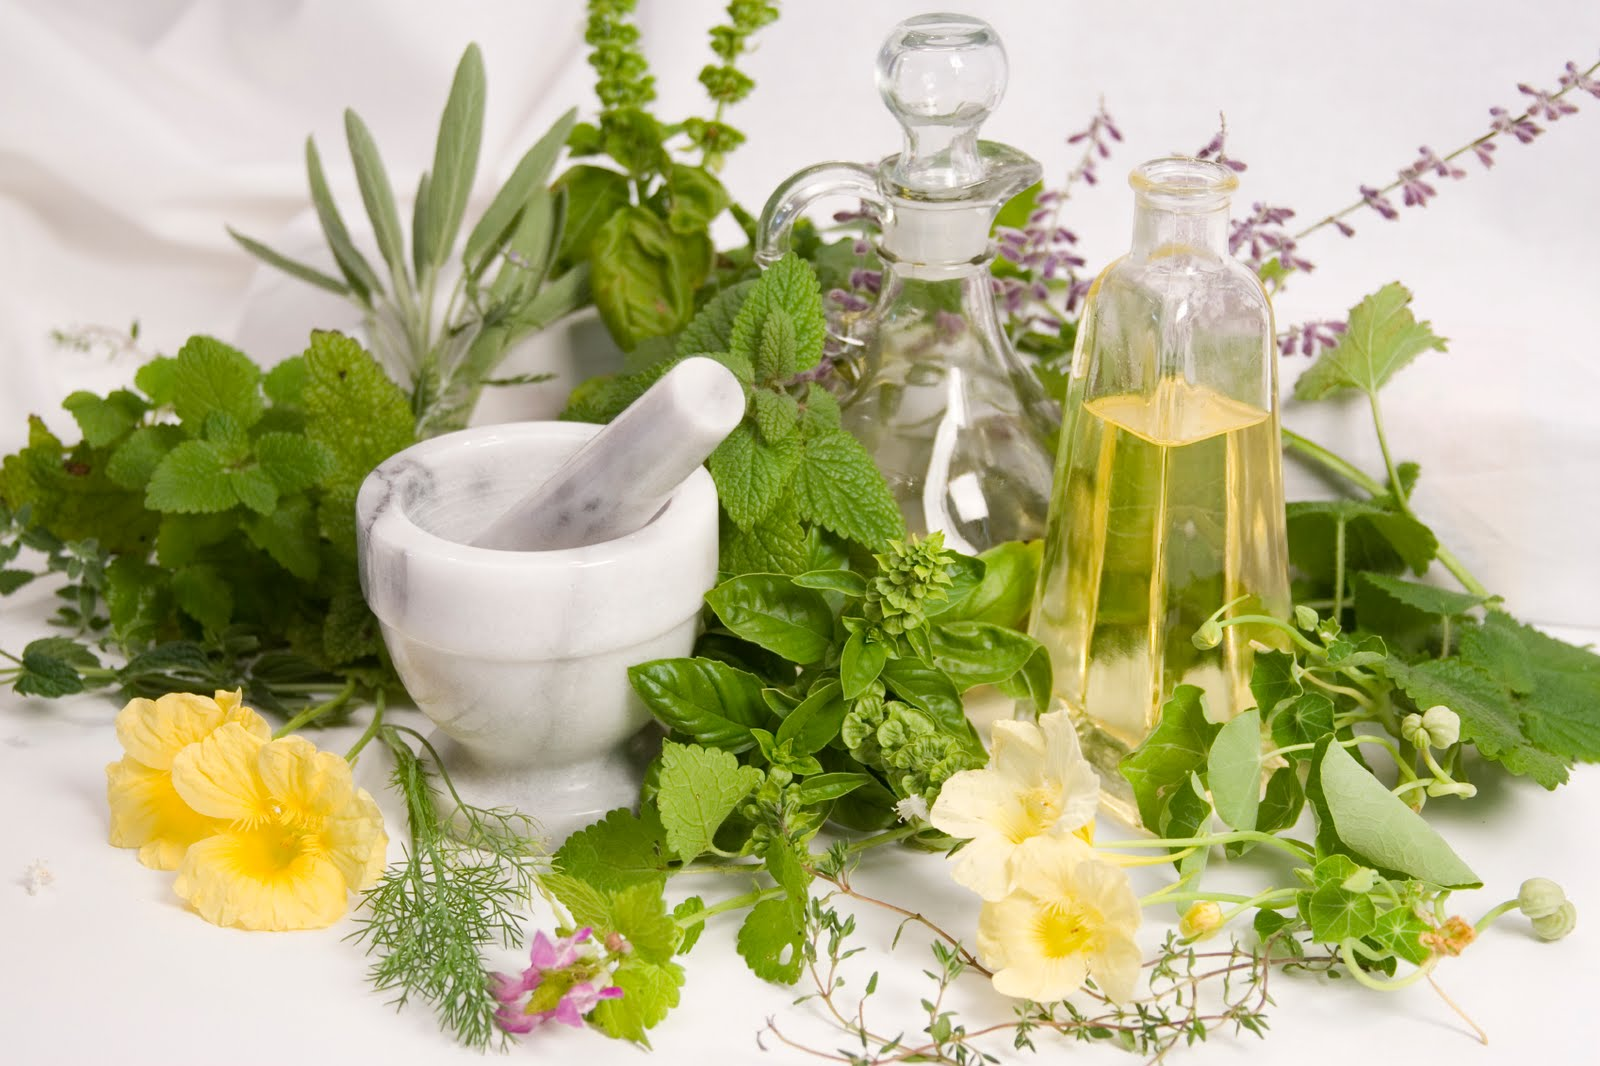 Conosci bene i rimedi naturali ? [QUIZ]